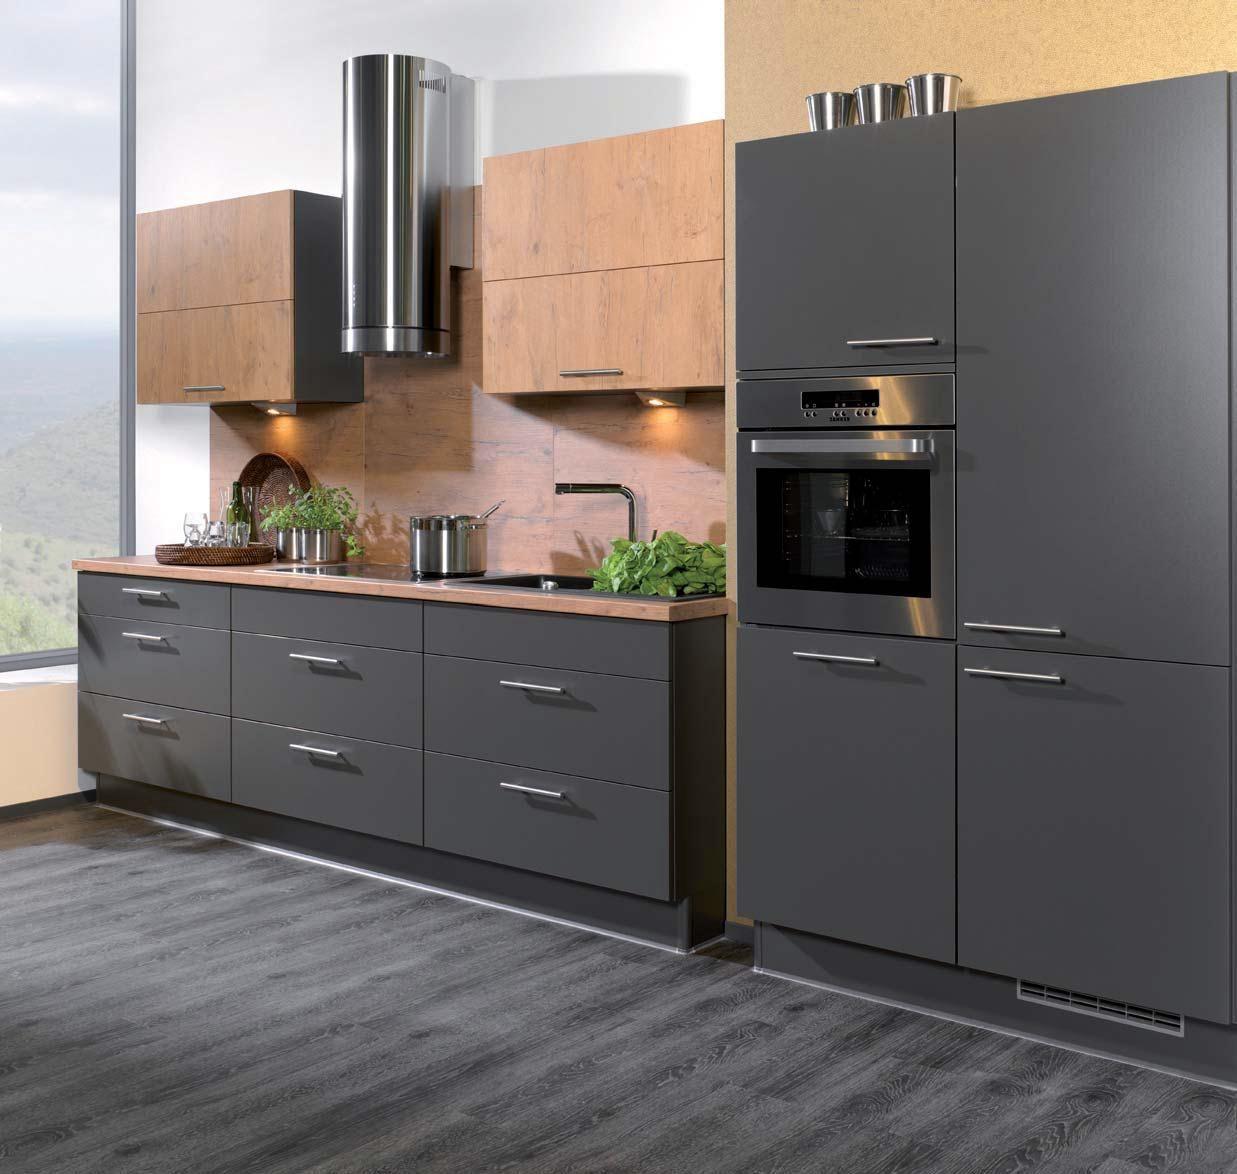 25 legjobb tlet a pinteresten a k vetkez vel kapcsolatban poco dom ne k chen k che. Black Bedroom Furniture Sets. Home Design Ideas